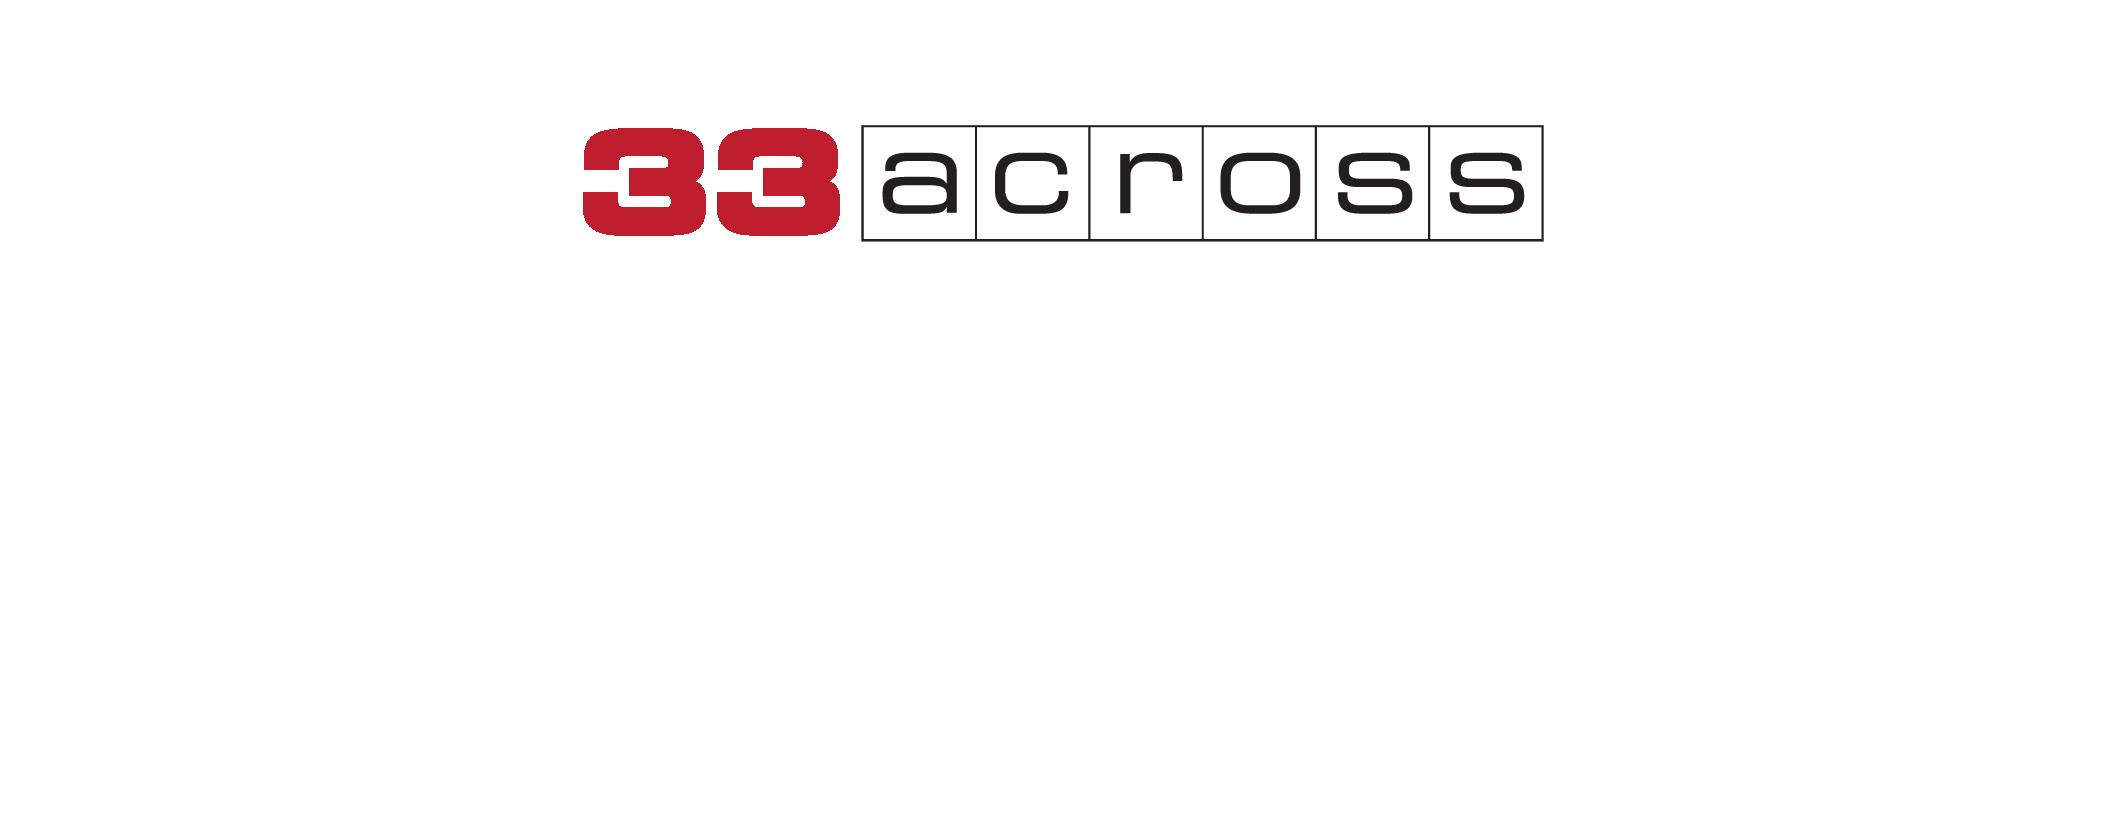 33Across_Lexicon_2colors